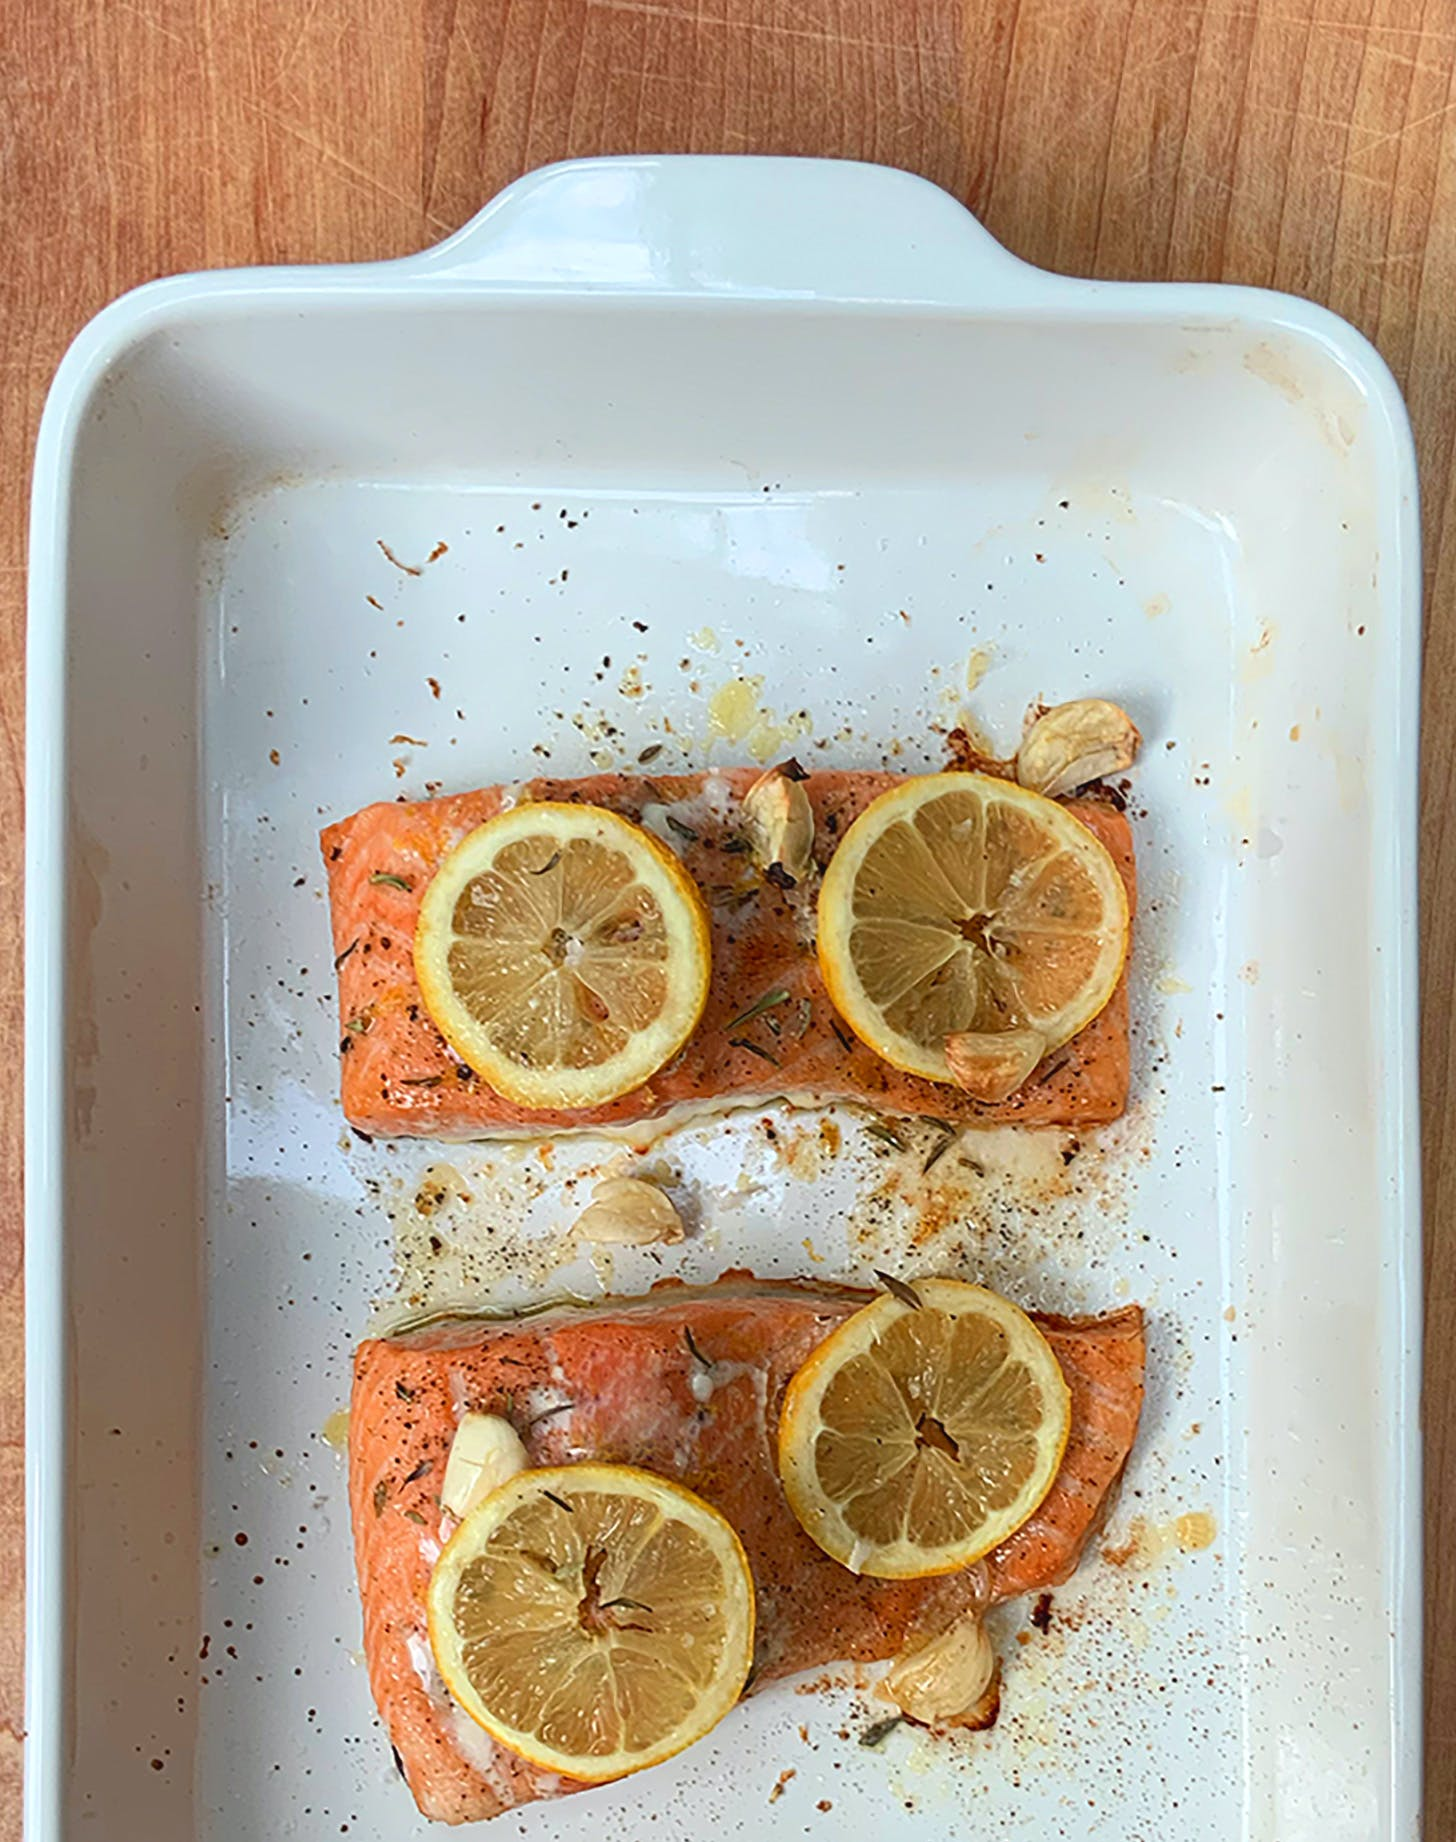 Lemon Salmon with Garlic and Thyme